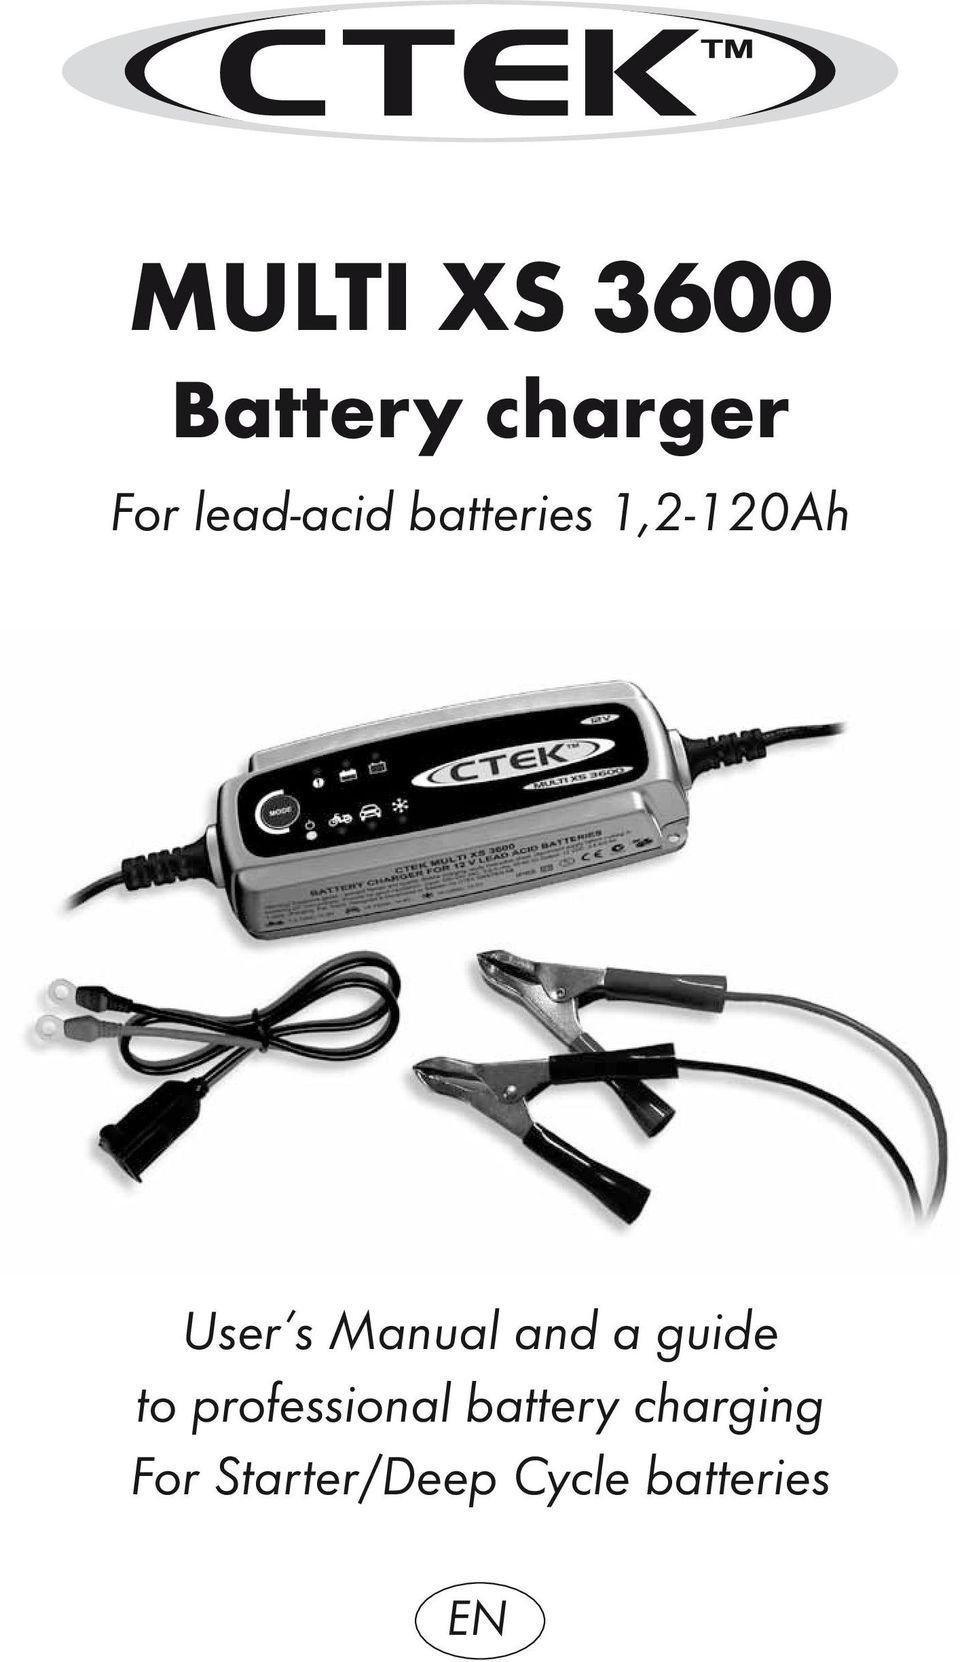 Mode Demploi Chargeur Bosch C3